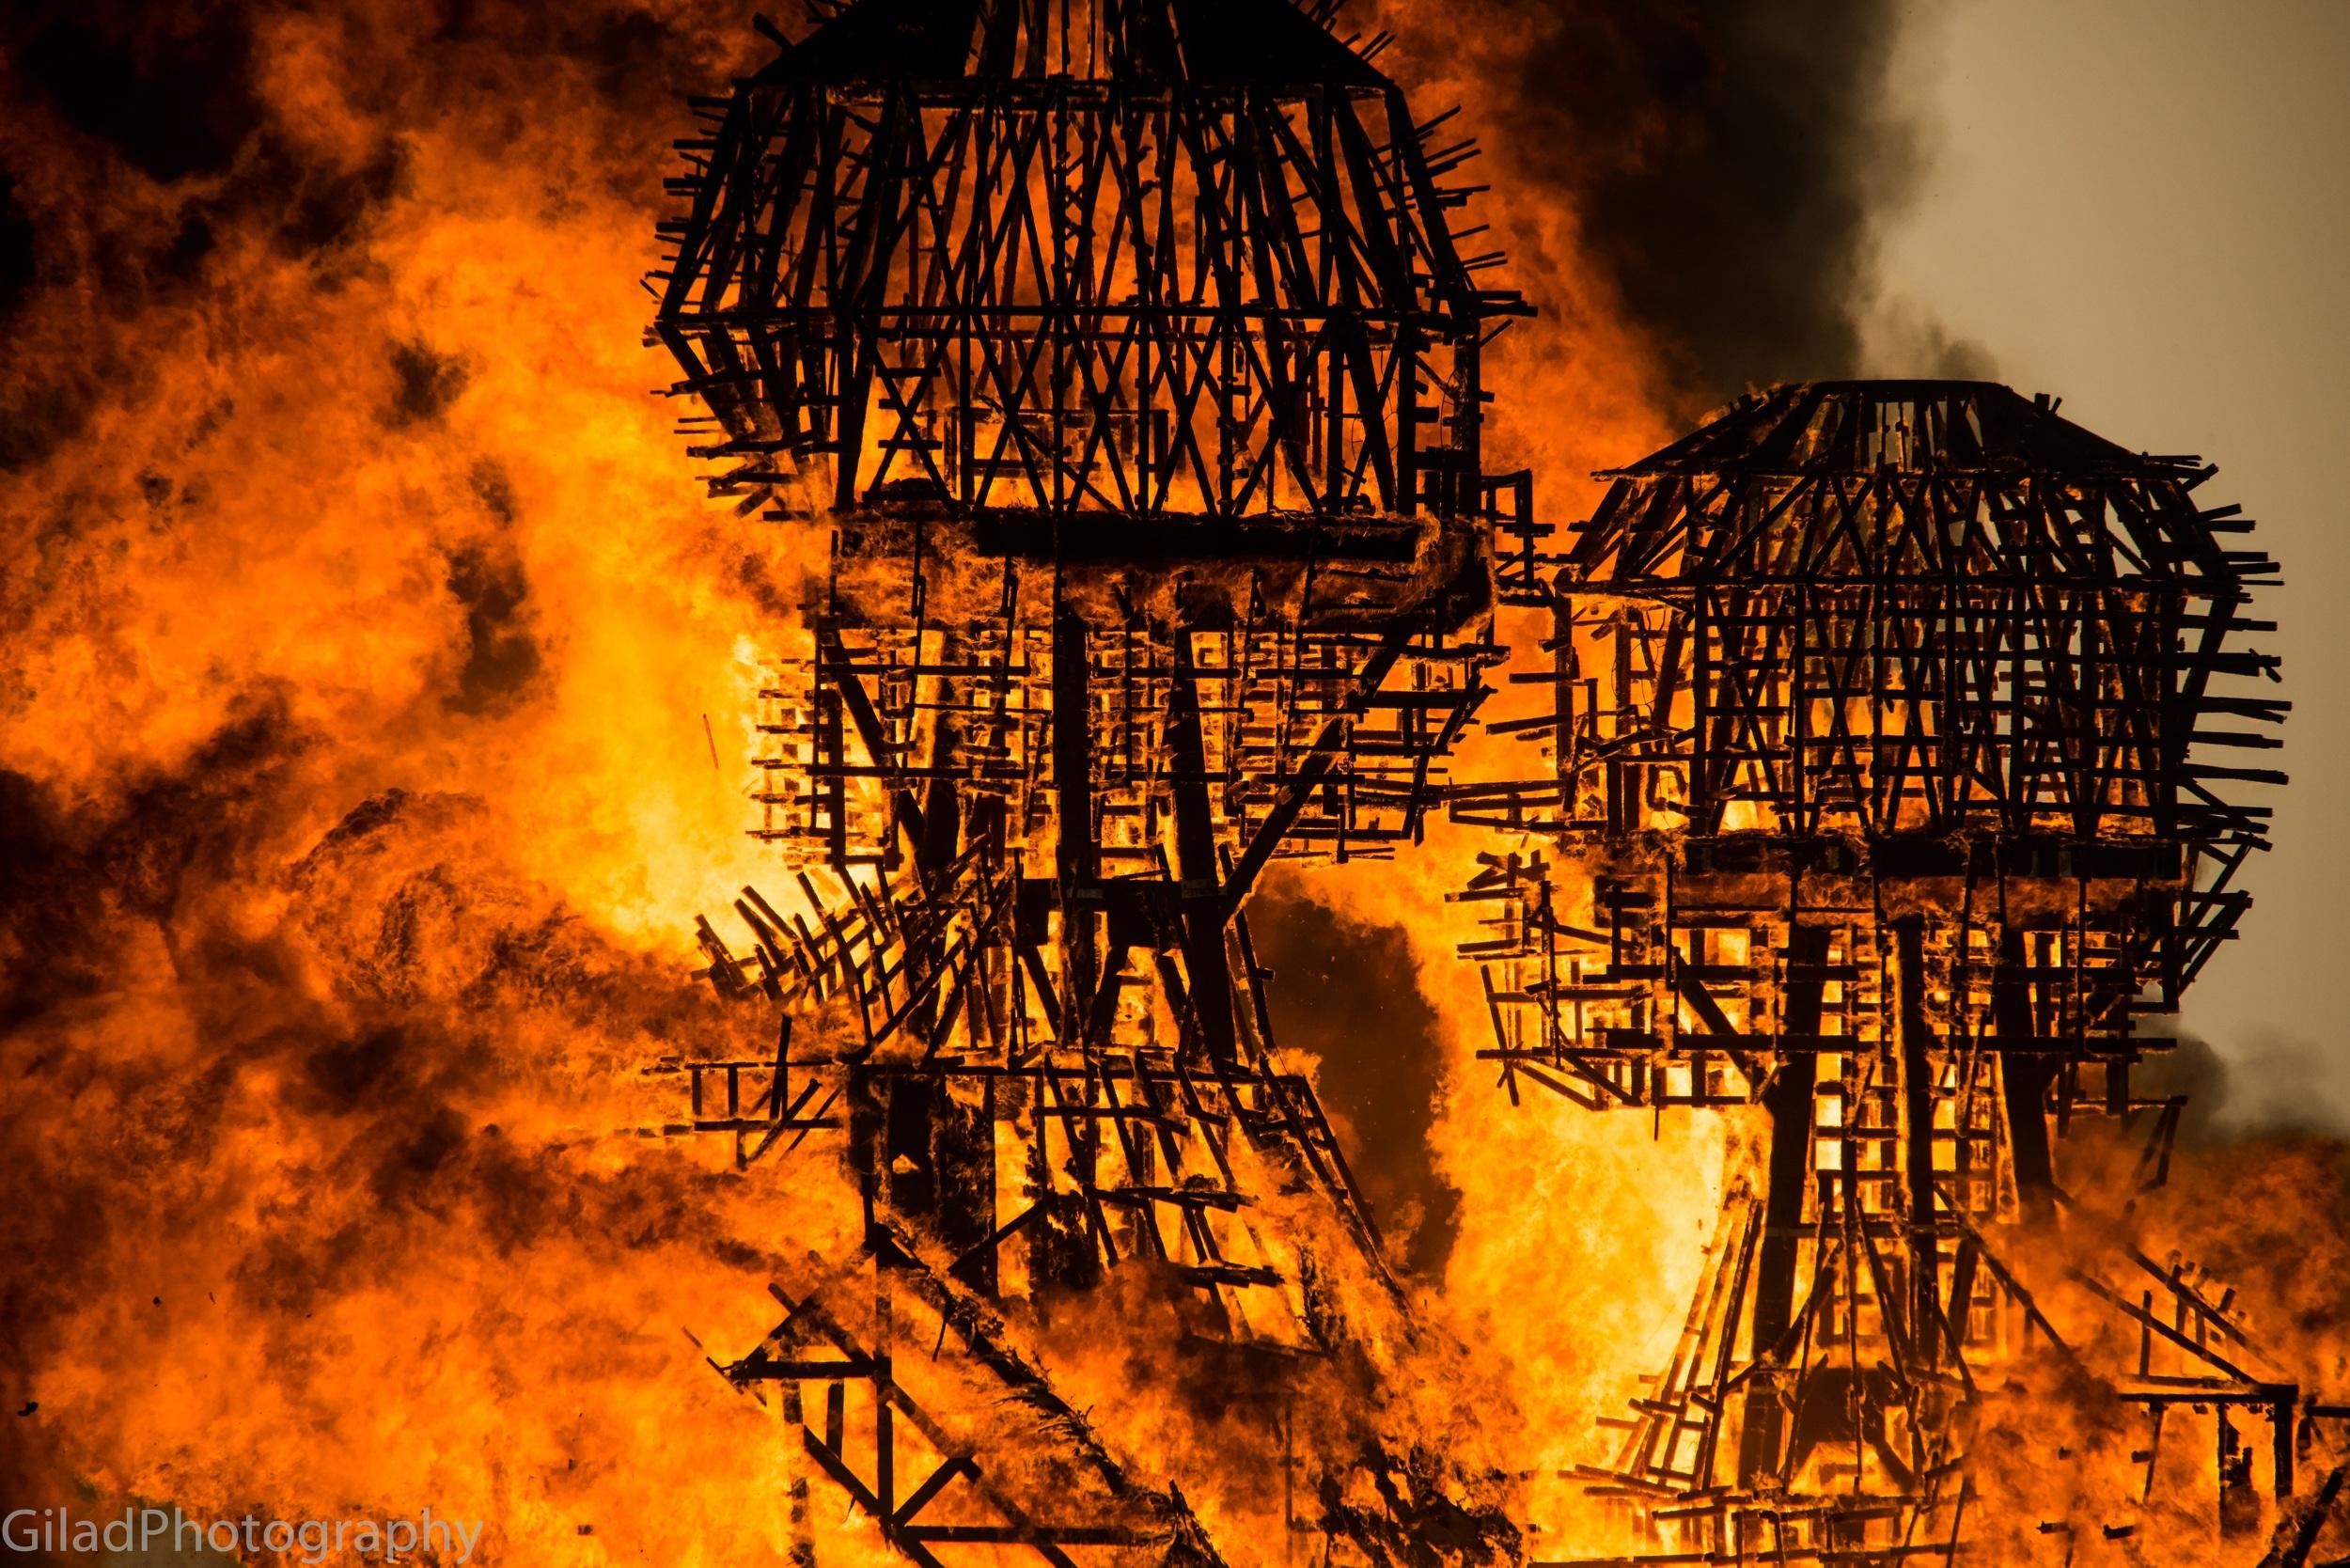 The Embrace burn 2014